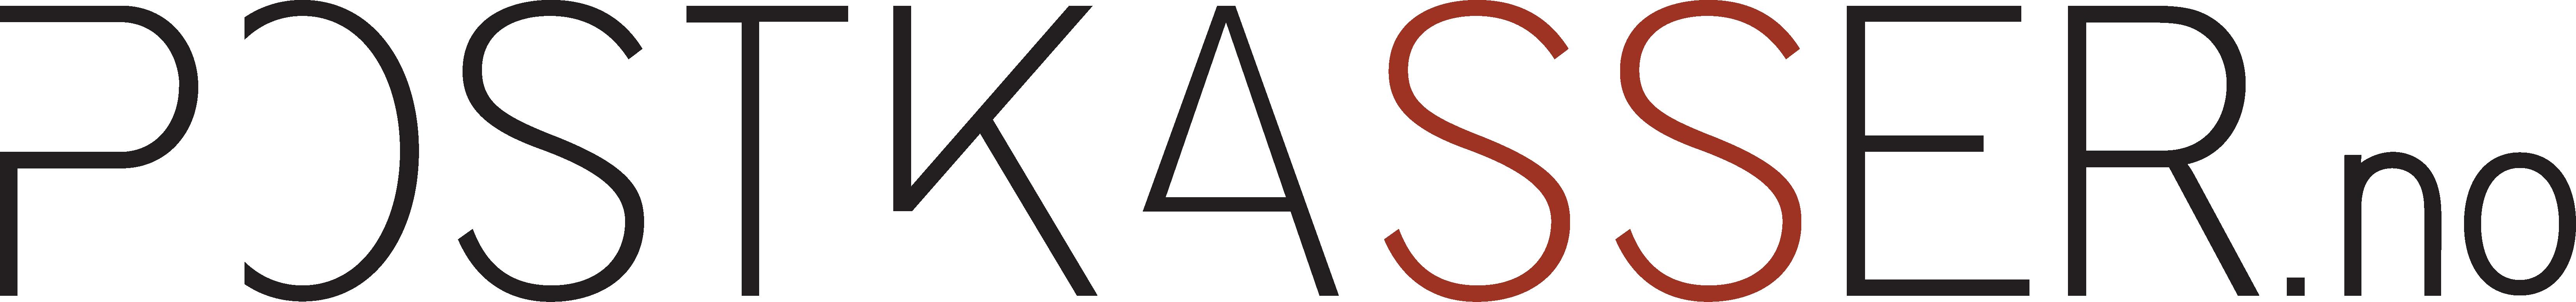 Logo postkasser.no